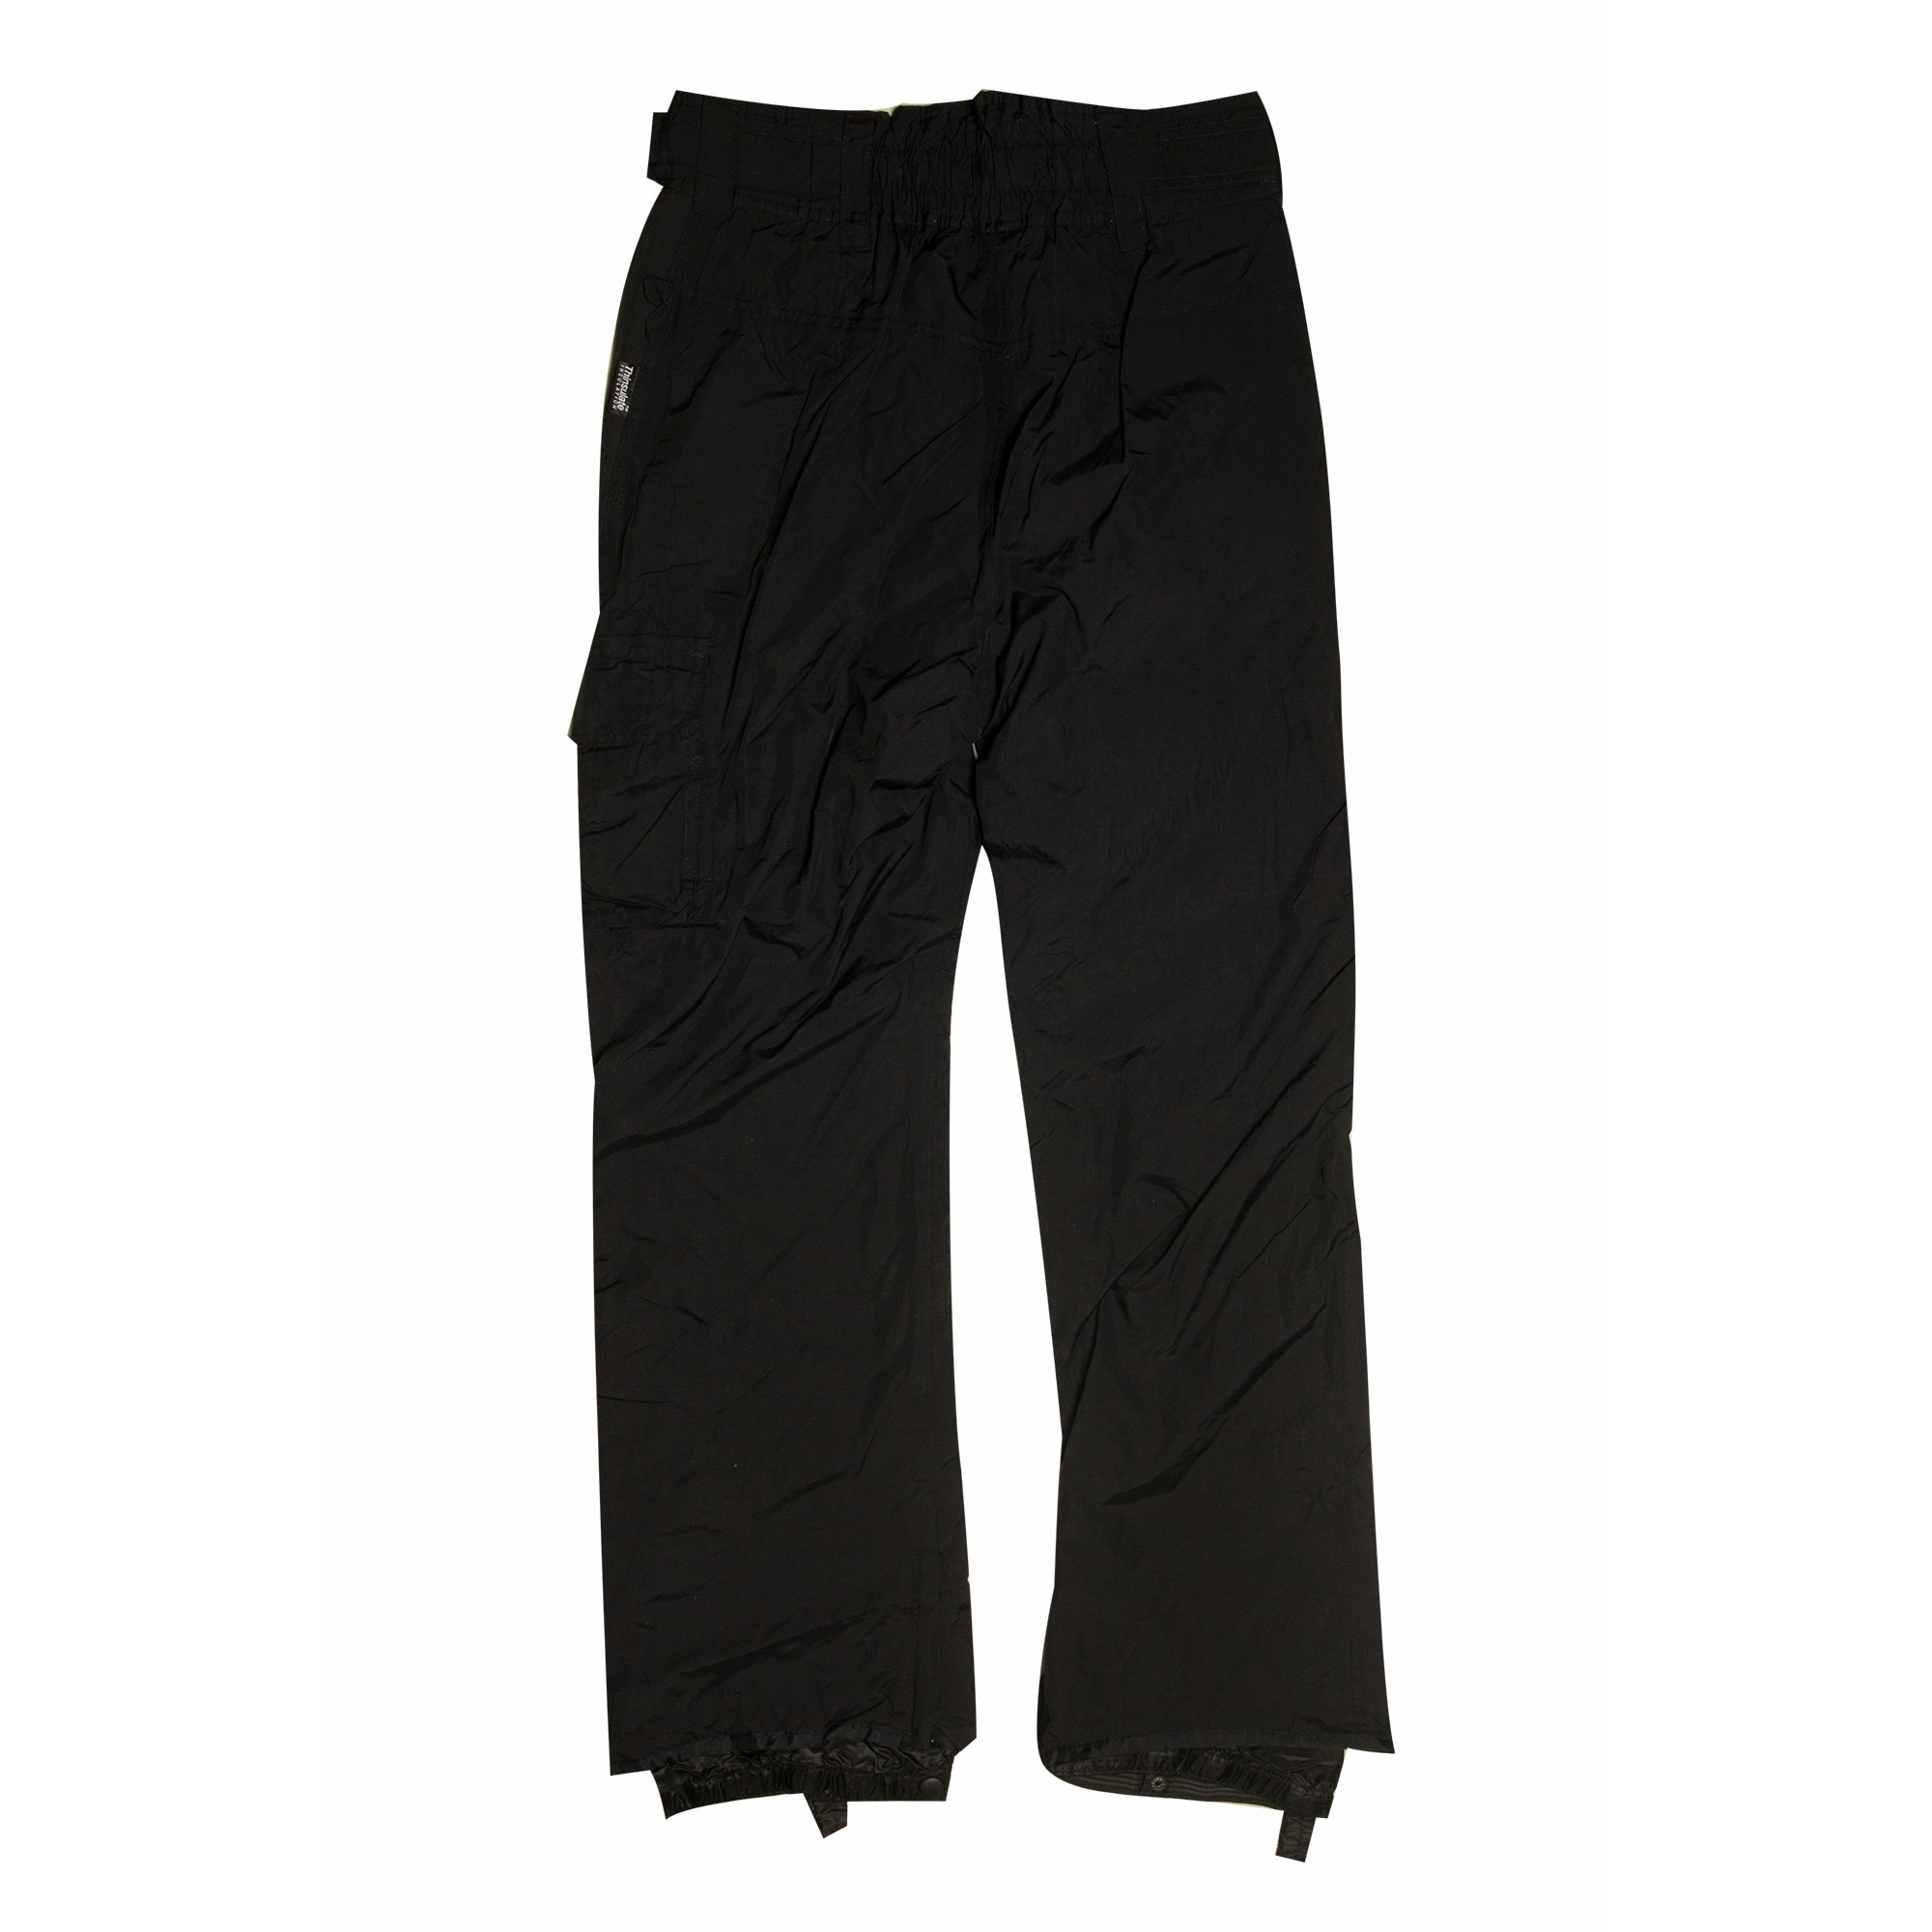 design nou magazin online bine out x Pantaloni ski barbati Crivit Sports, impermeabili, rezistenti la vant  puternic, Negru, Marime 56 - eMAG.ro